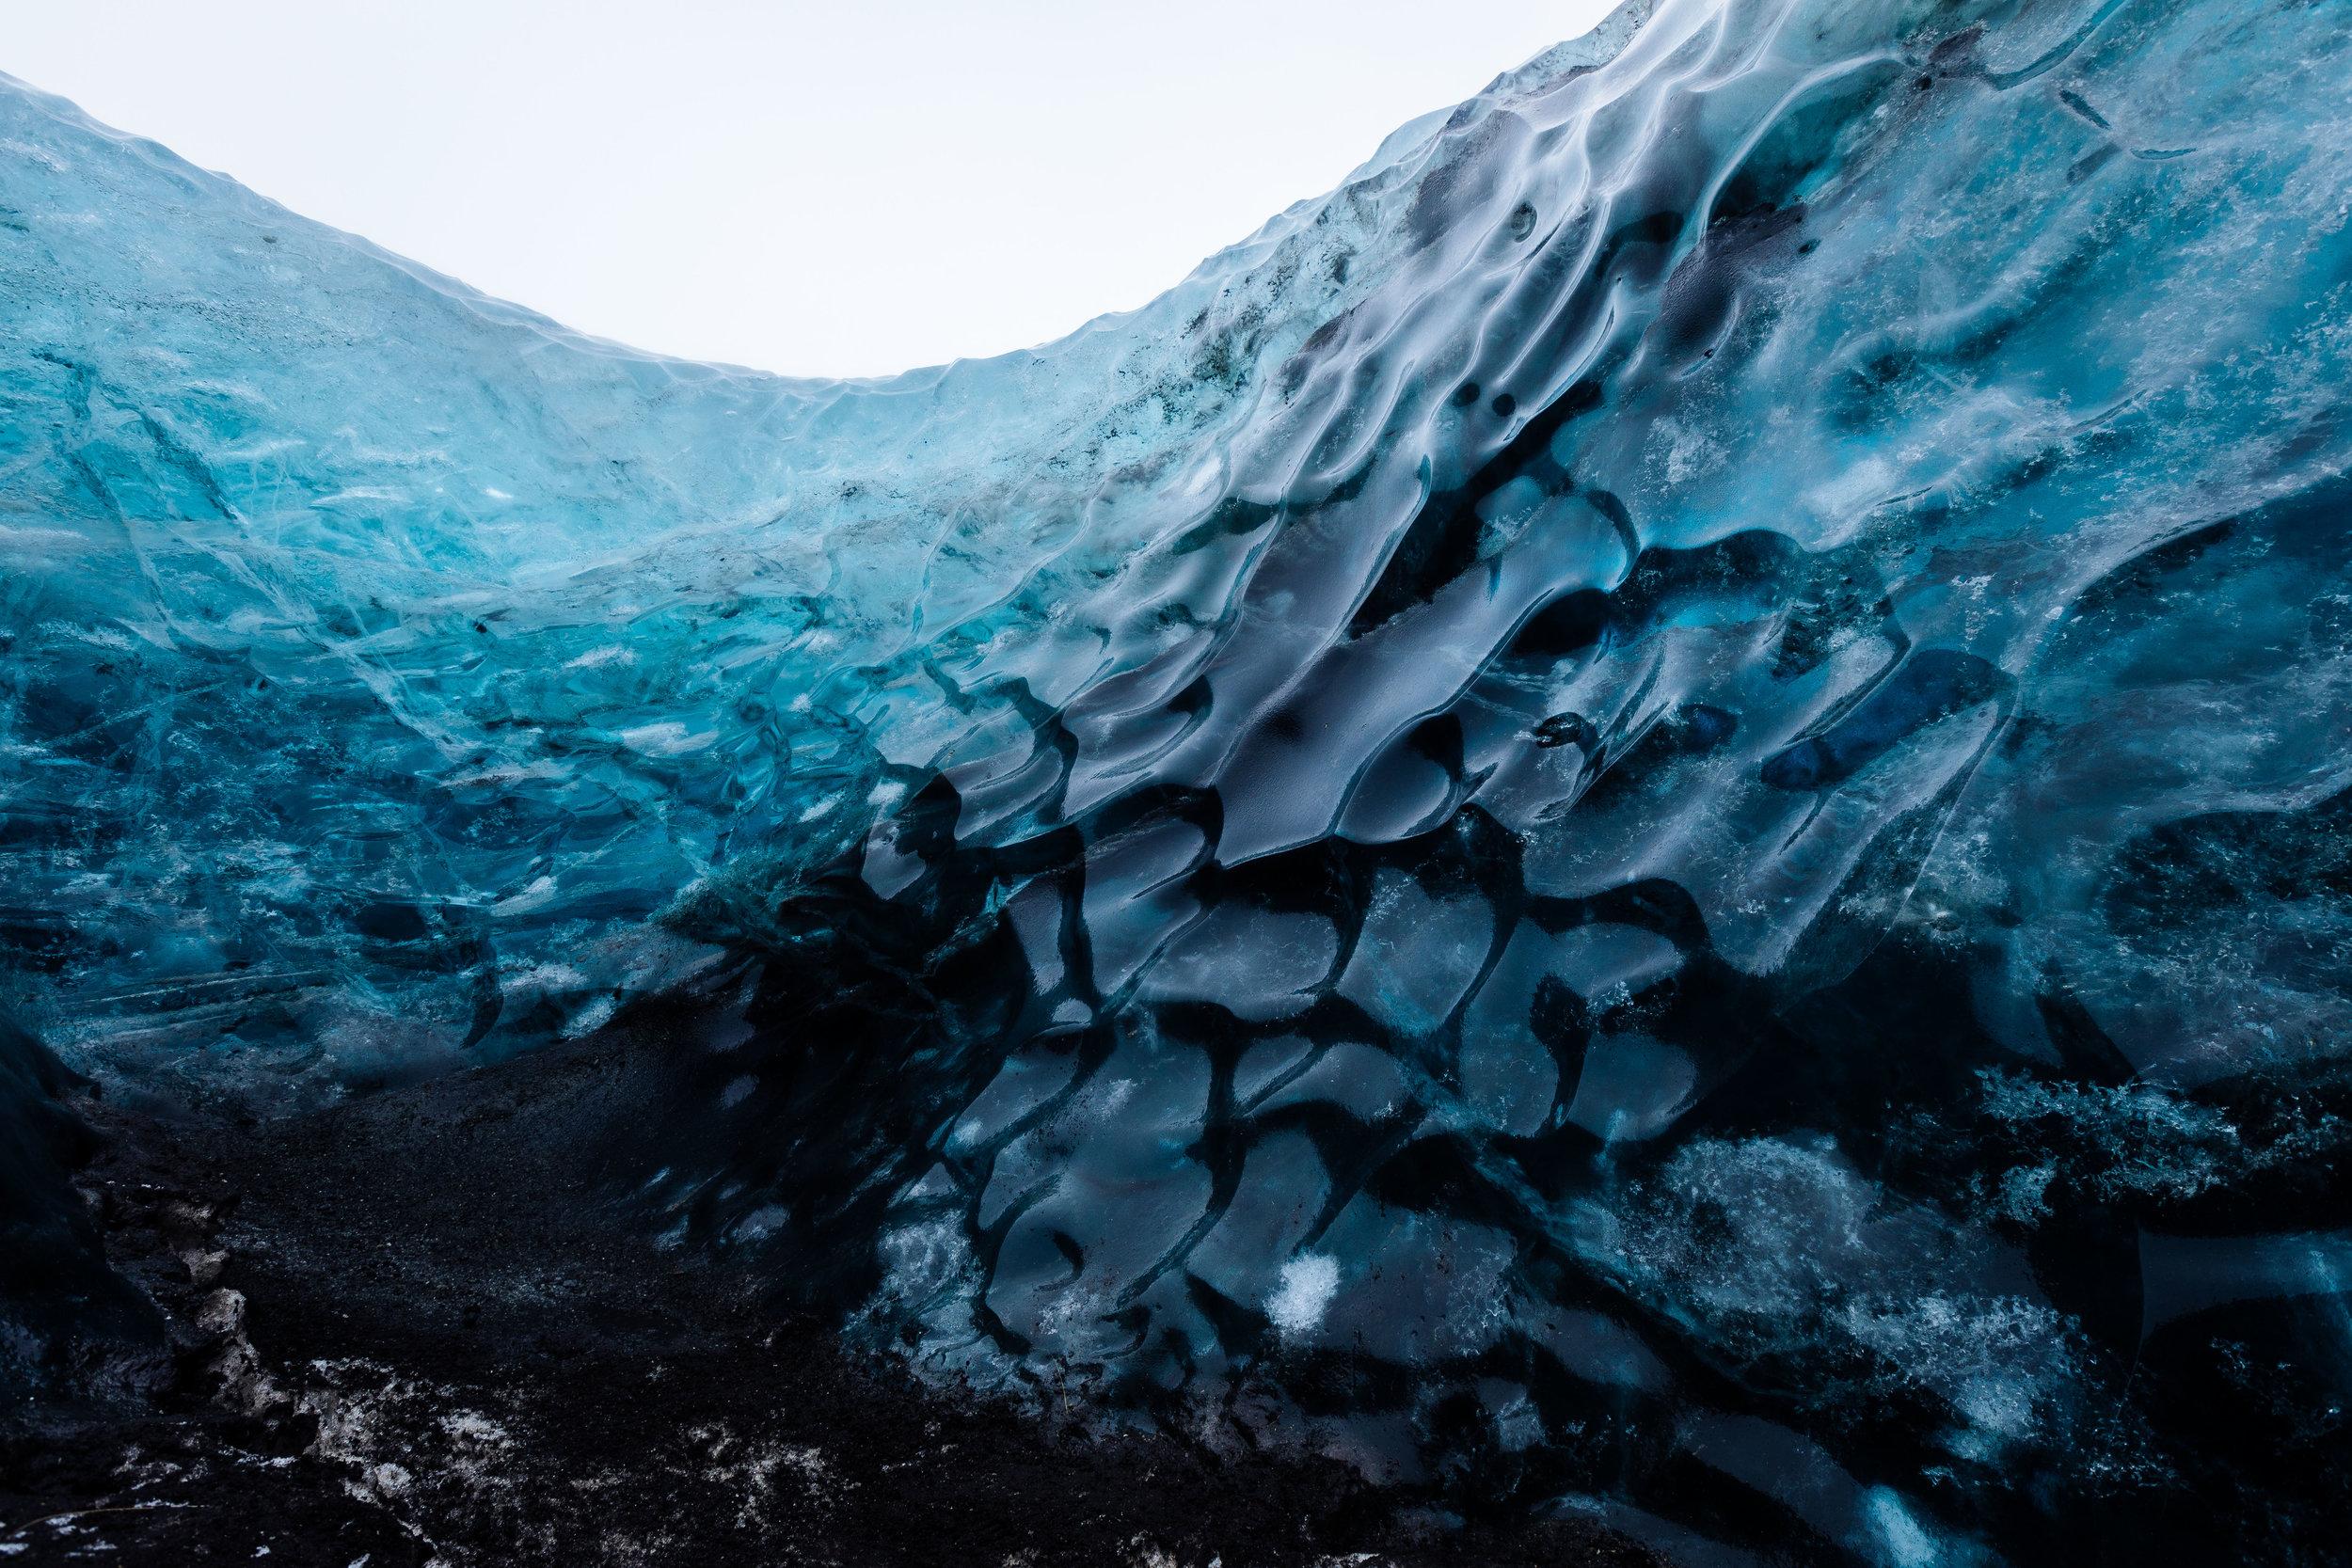 aqm-iceland-20170204-1011.jpg